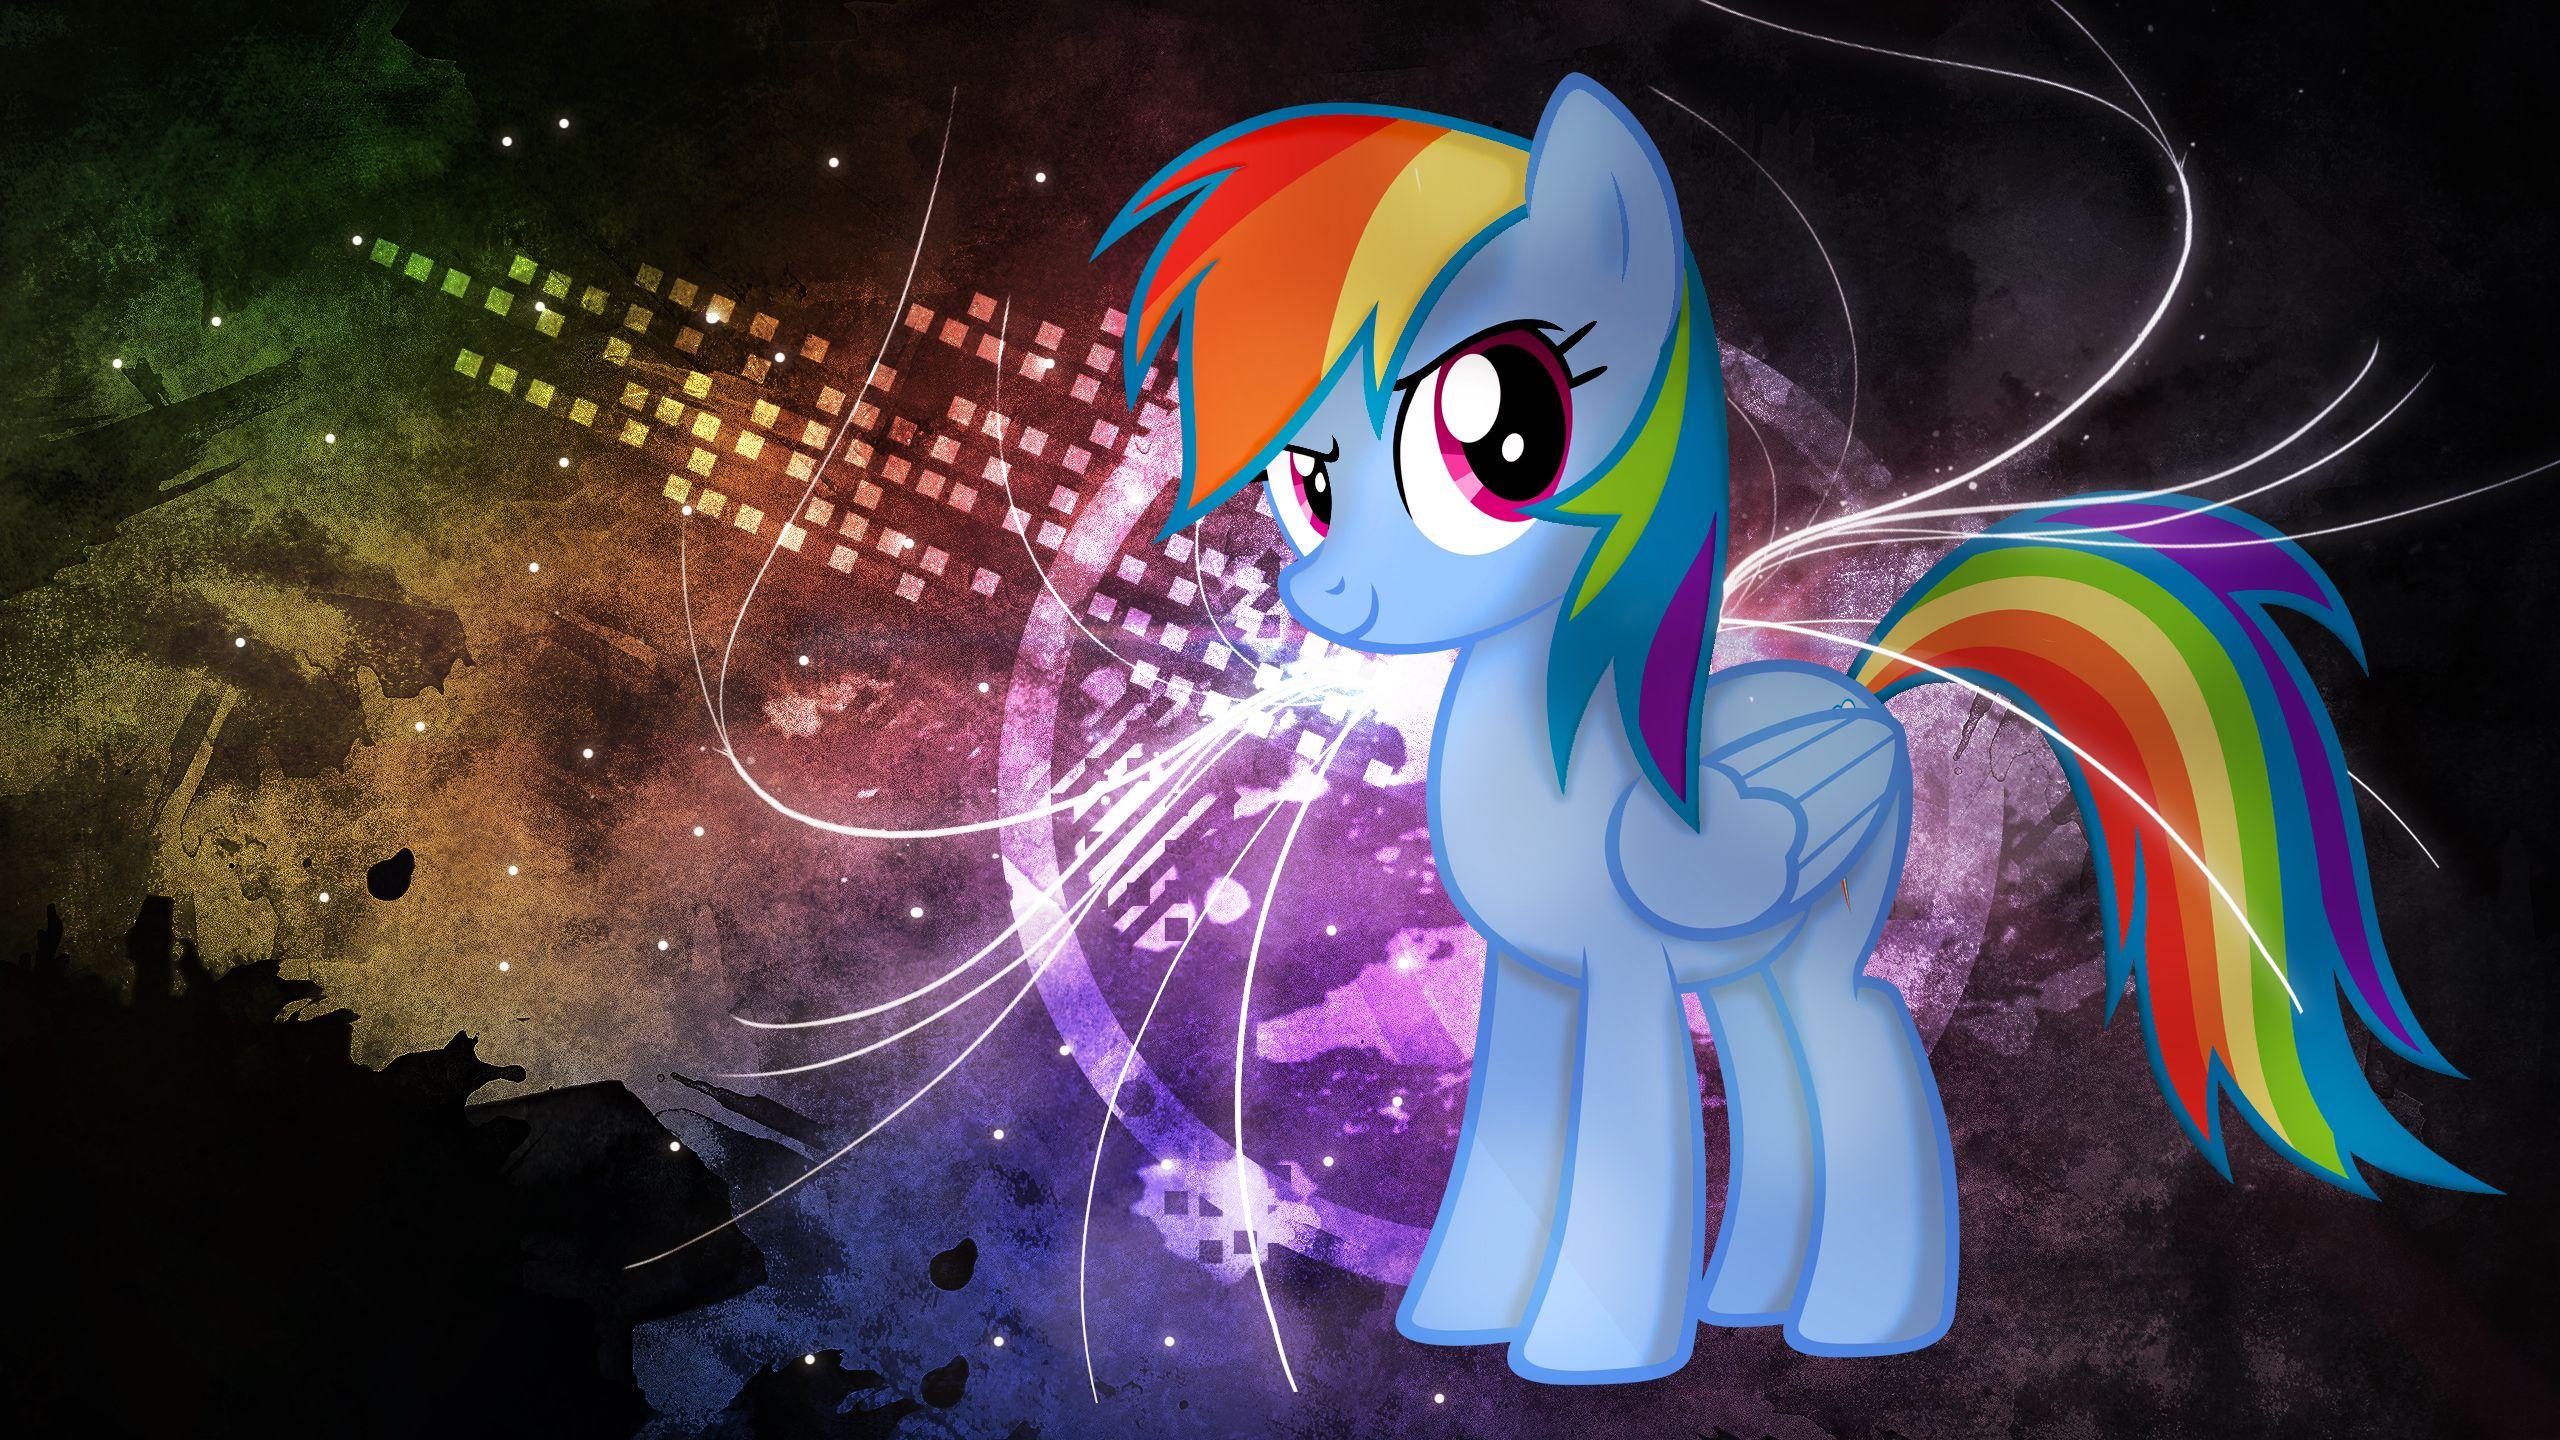 Rainbow Dash Neon Graffiti MLP My Little Pony Friendship is